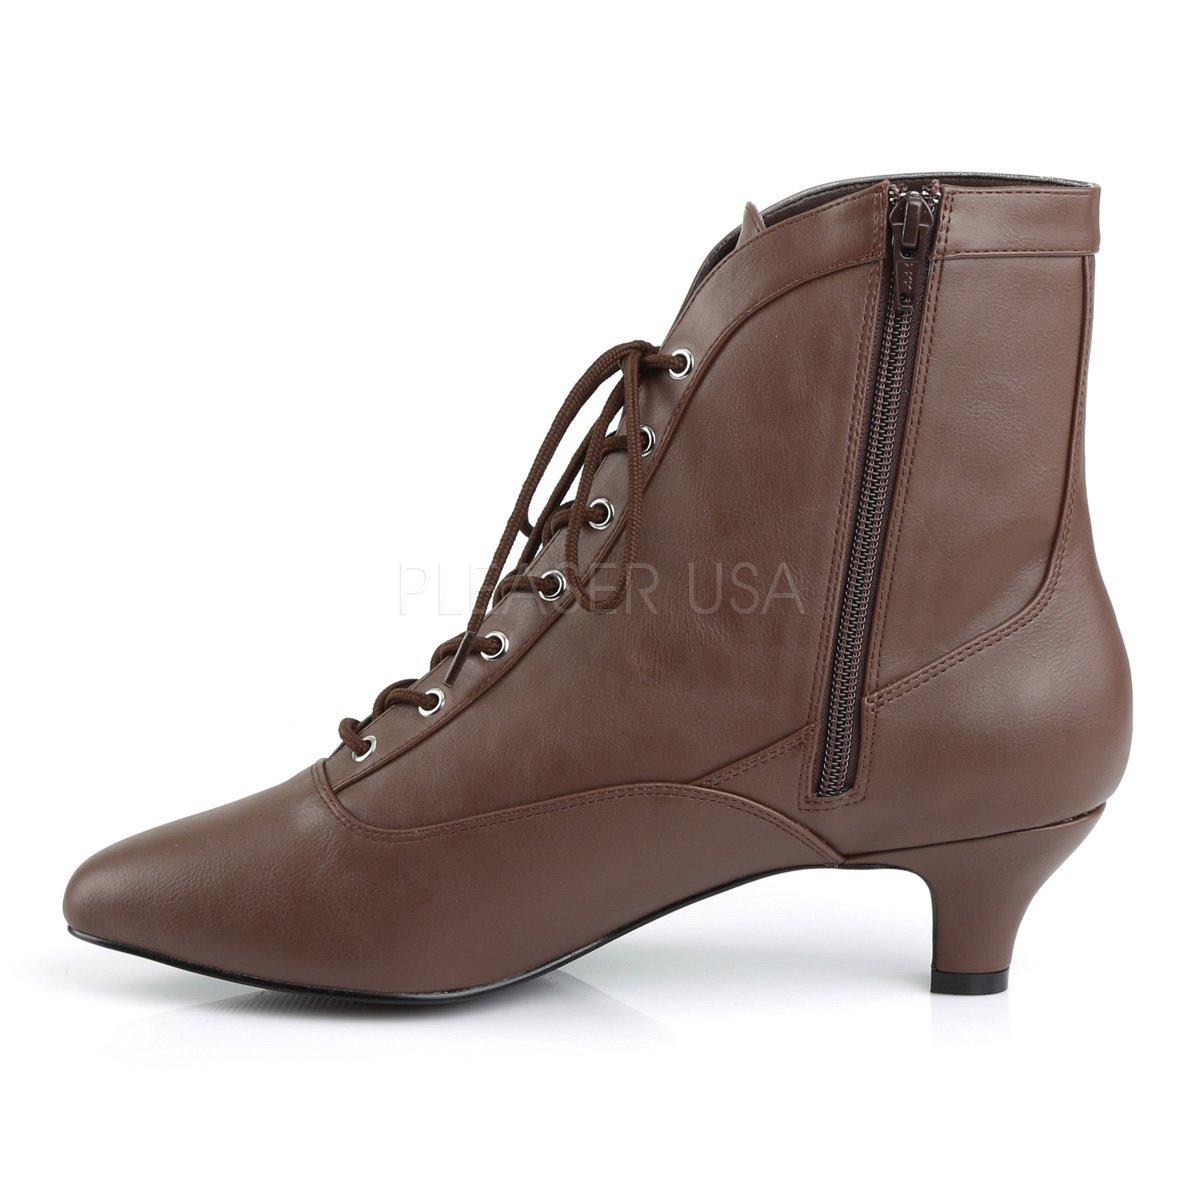 Higher-Heels Rosa Label Big Größe Stiefeletten Stiefelies Stiefelies Stiefelies Fab-1005 braun Übergröße 8bcffb